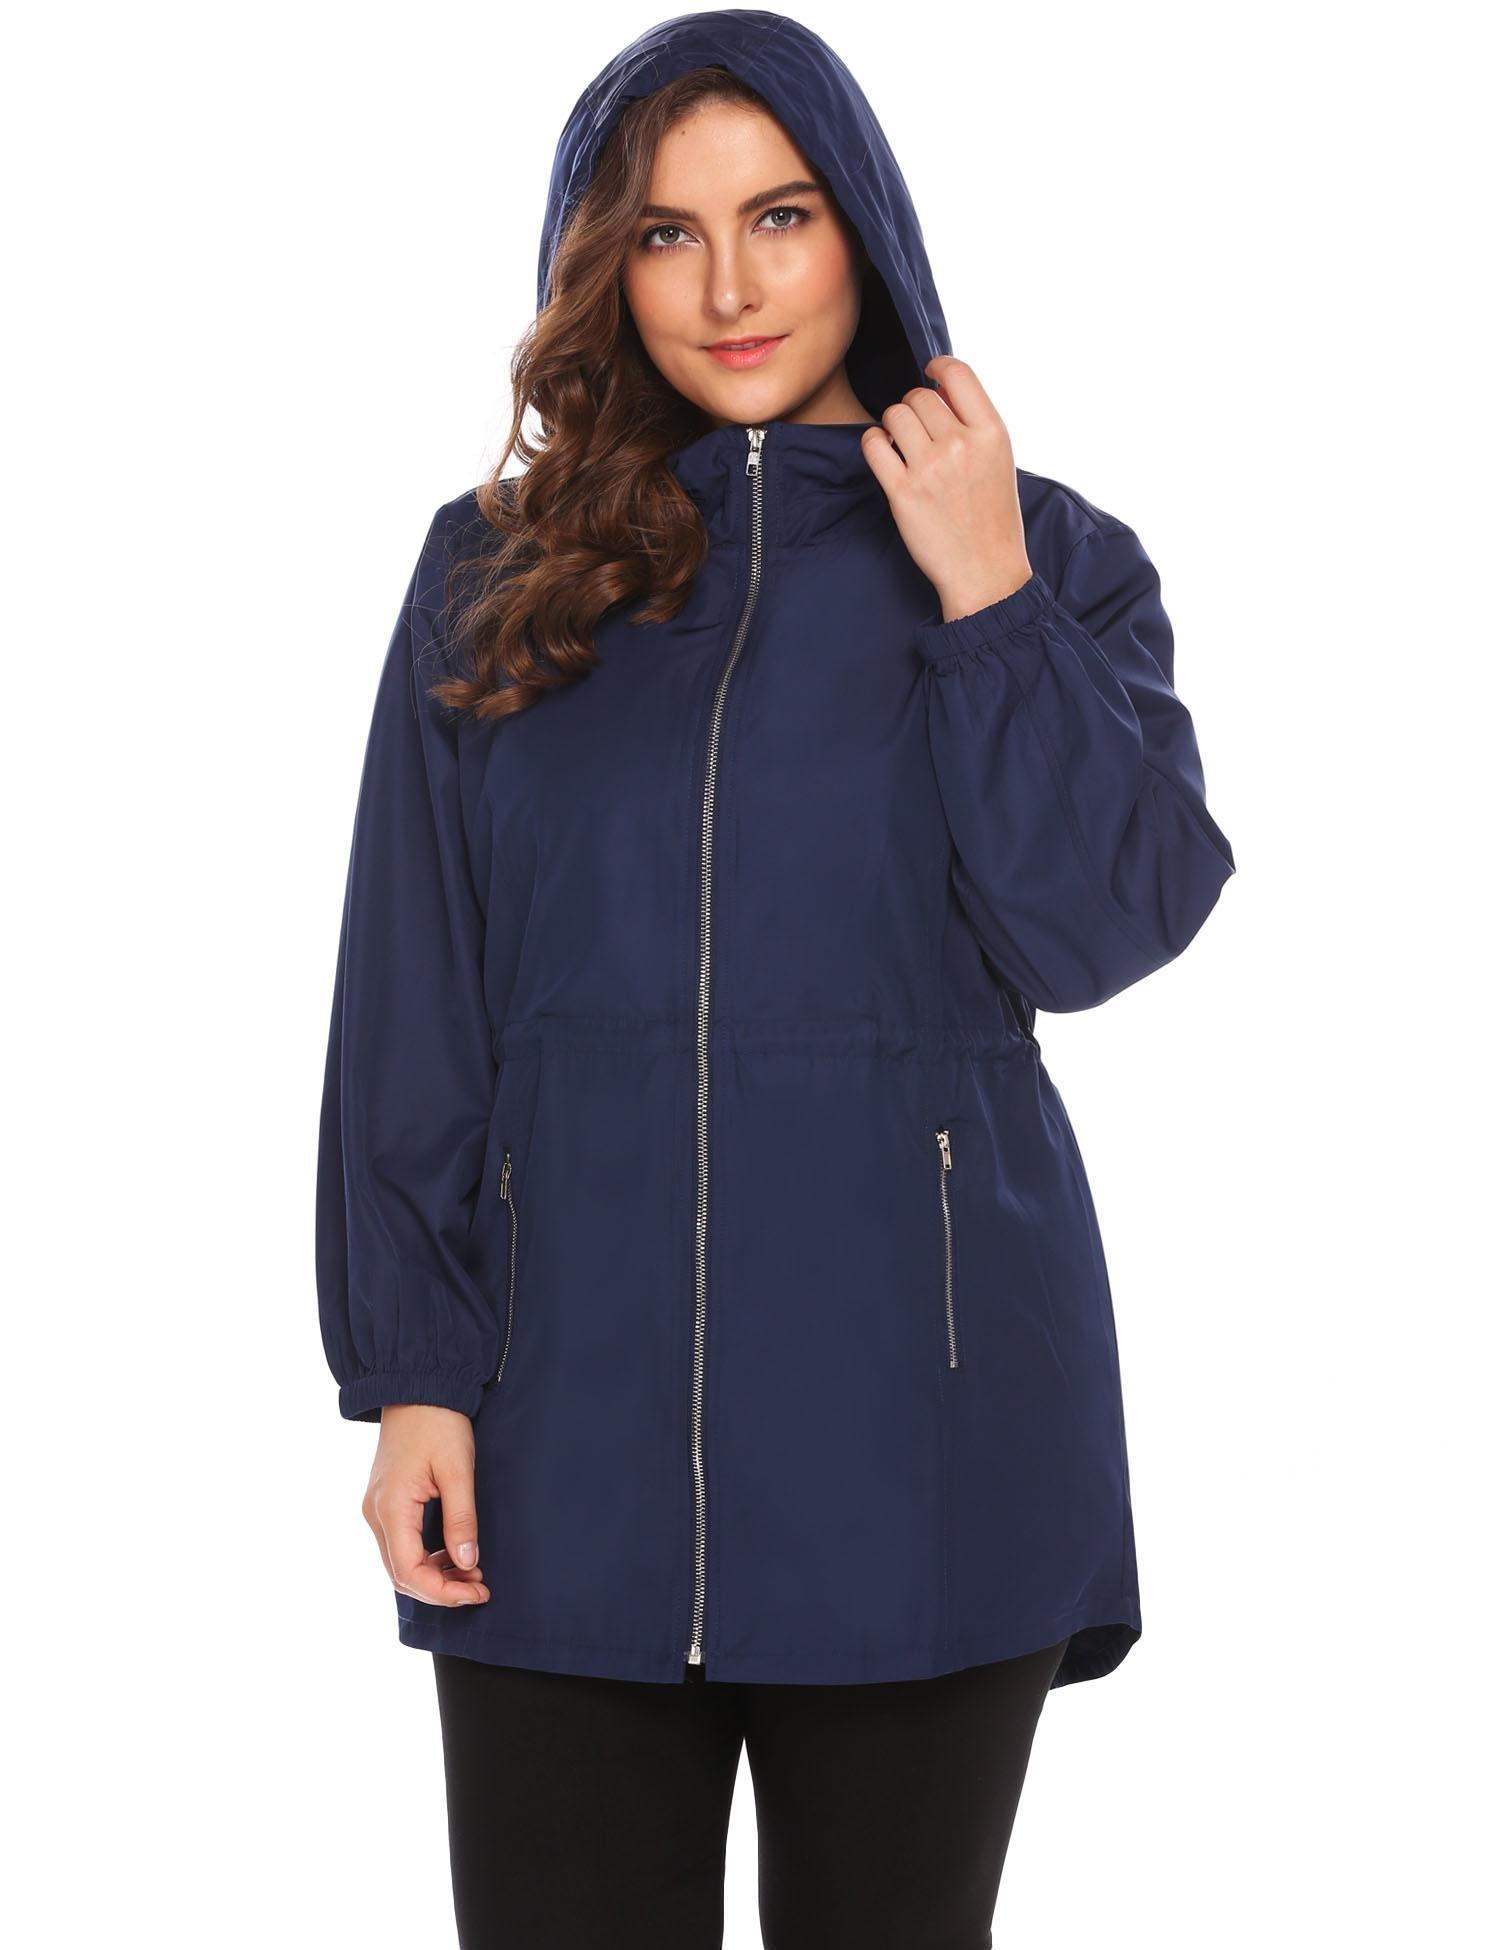 Involand Plus Size Lightweight Windbreaker Raincoat Travel Hoodie Rain Jacket Windproof Hiking Portable Waterproof Coat